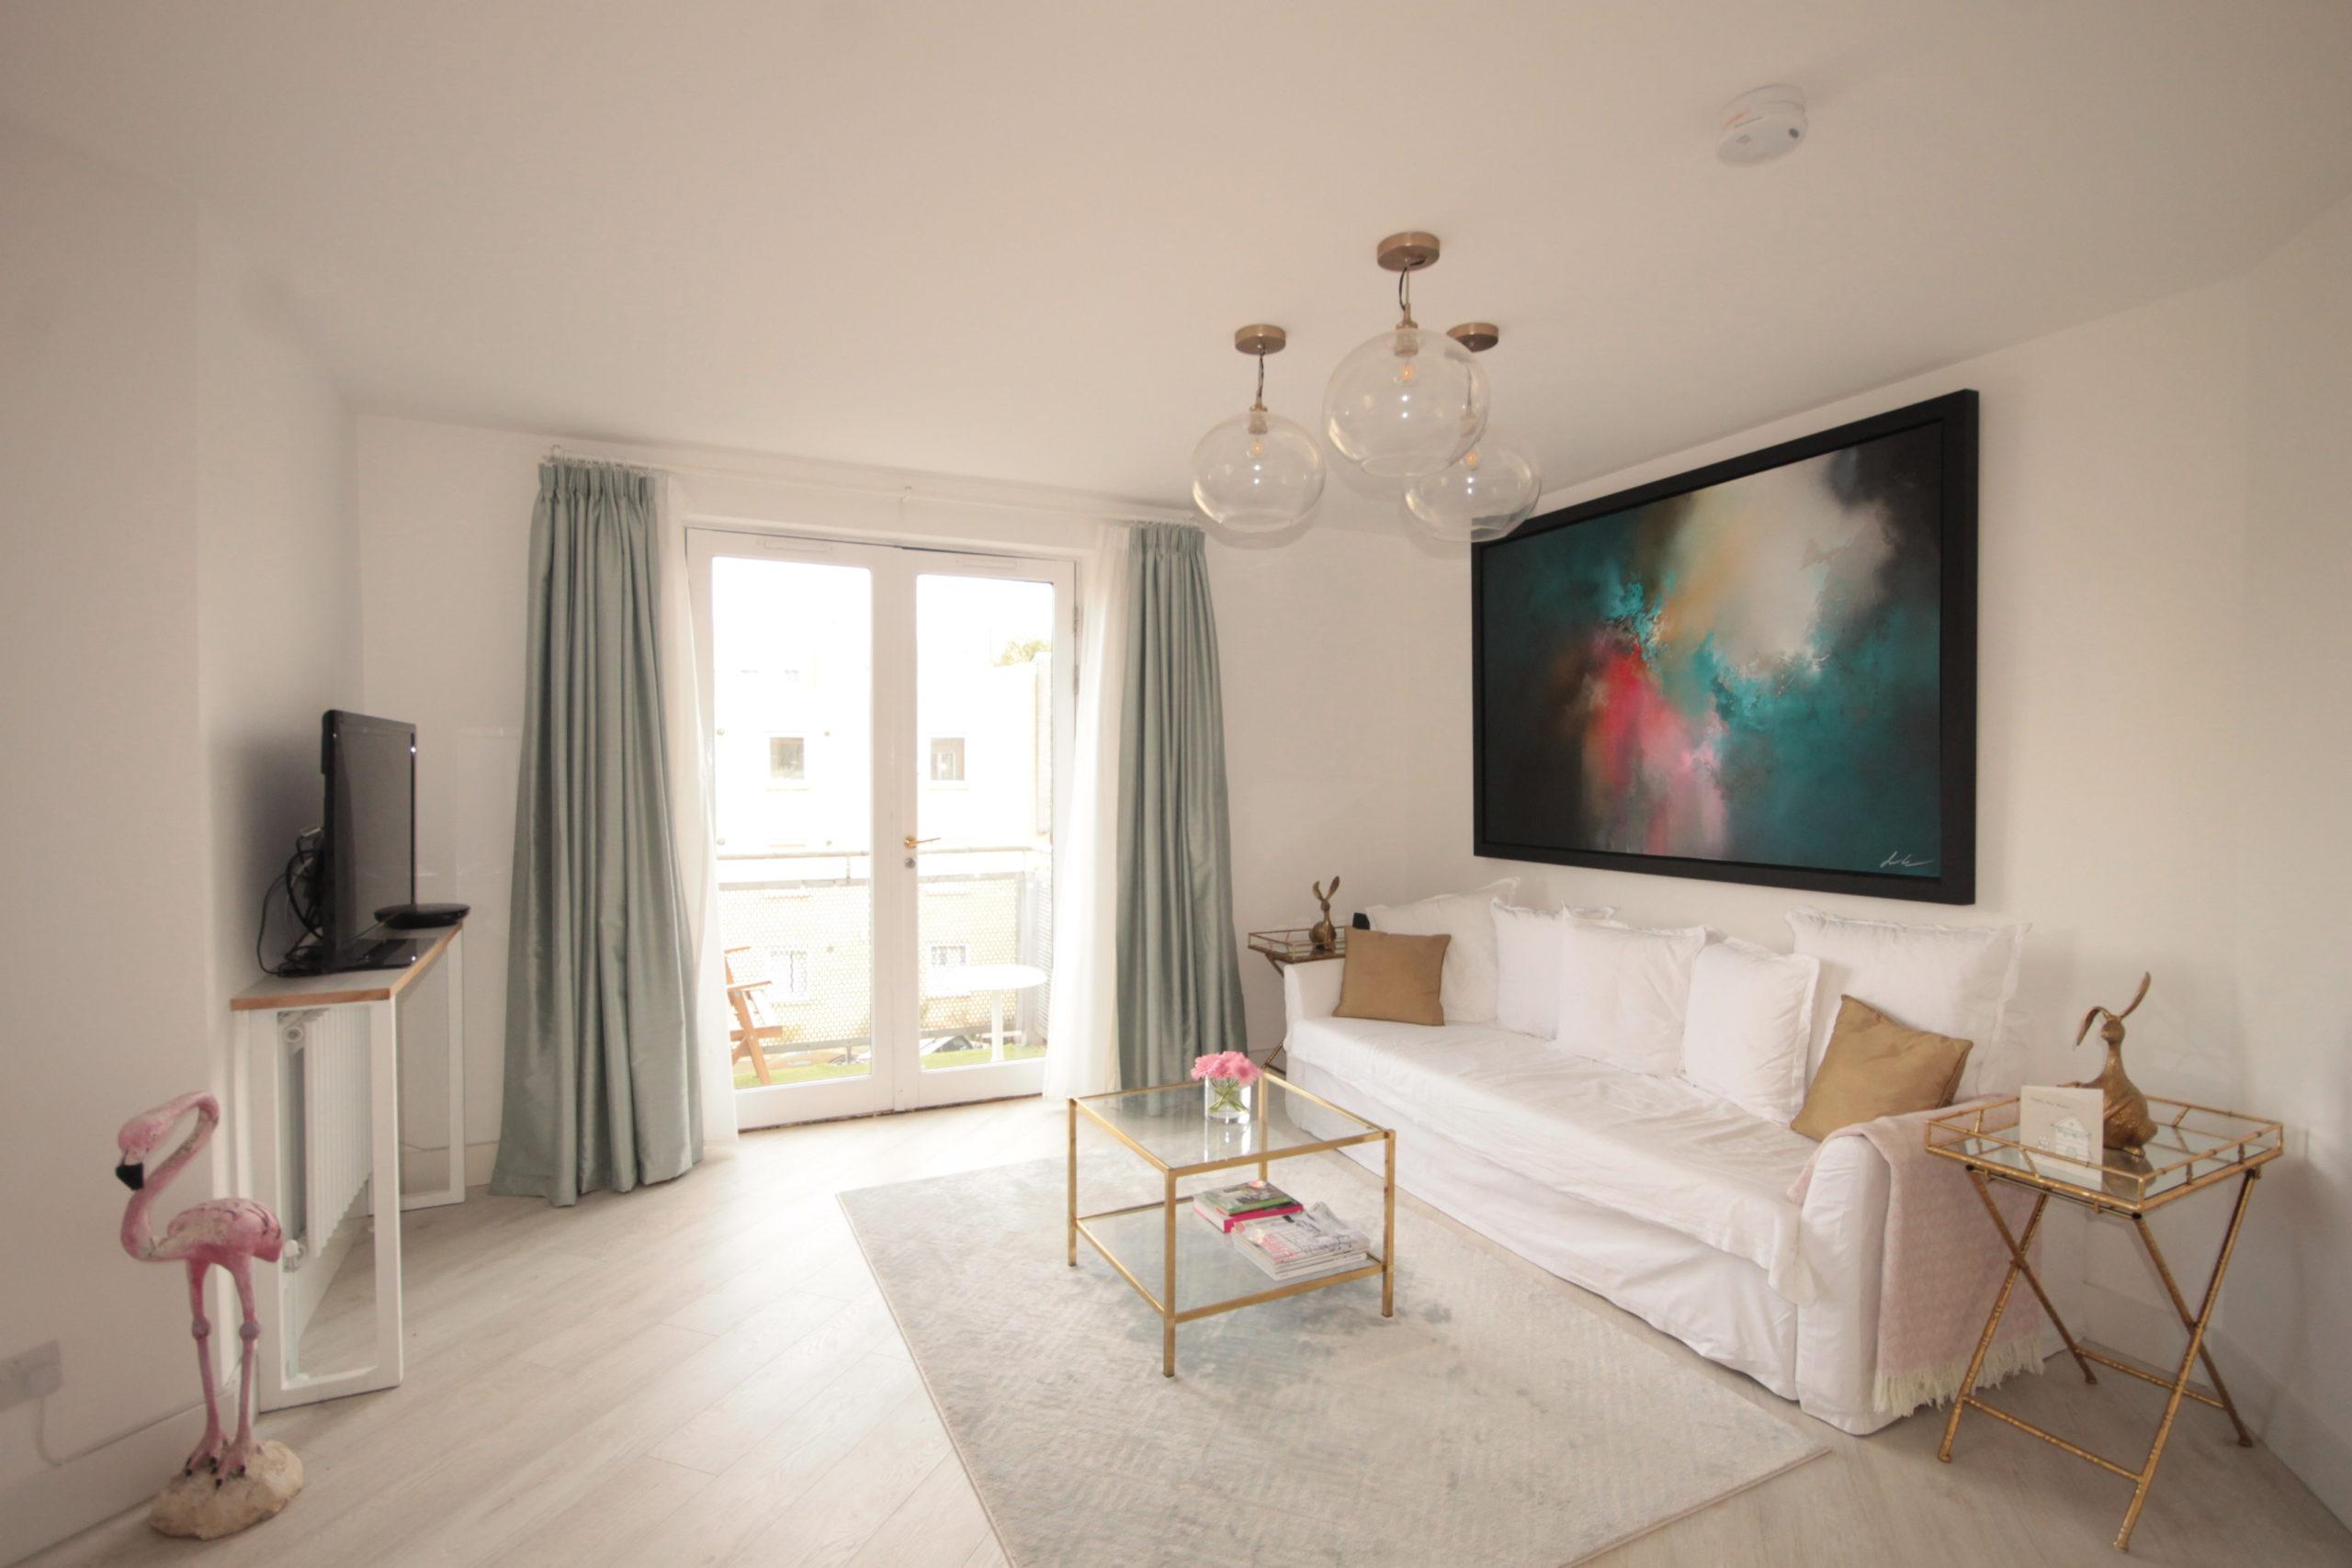 2 Bedroom, Milligan St, London, E14